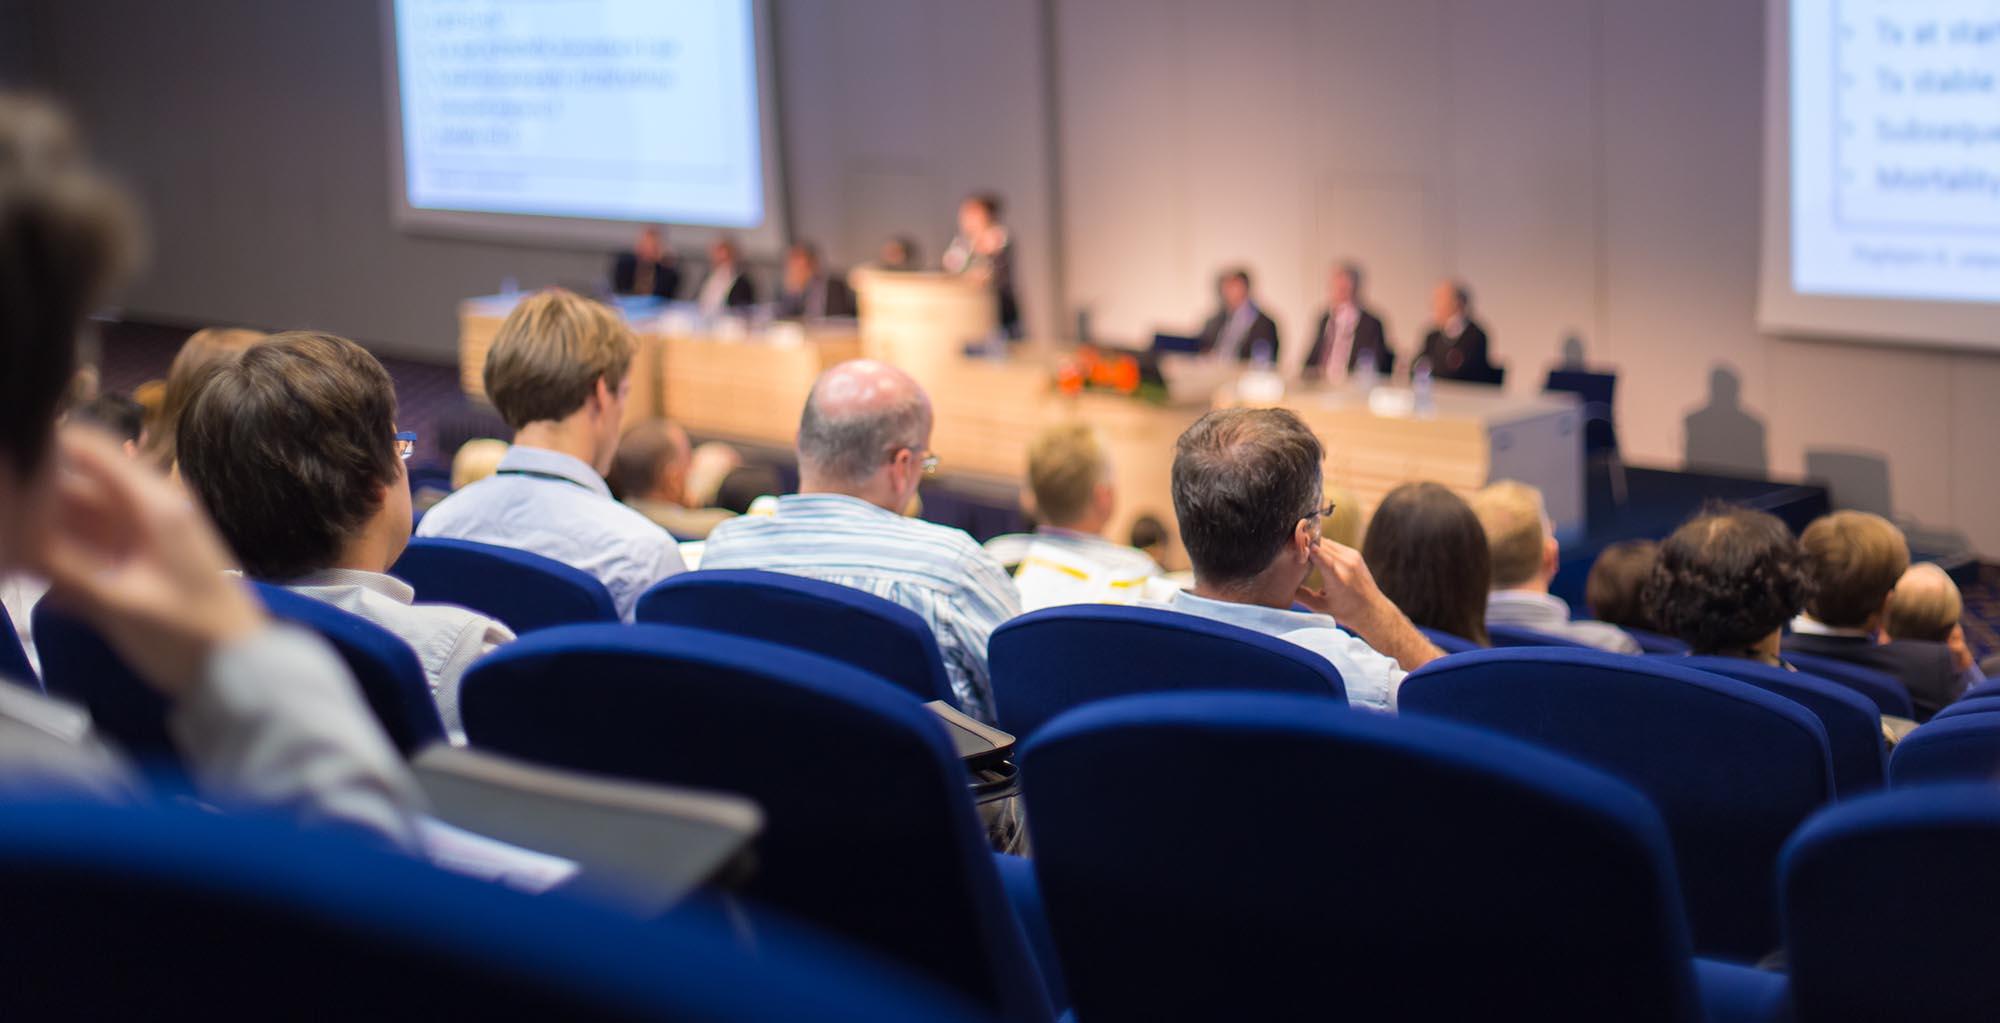 konferenciya-iforum-krupnejshee-meropriyatie-sredi-it-specialistov